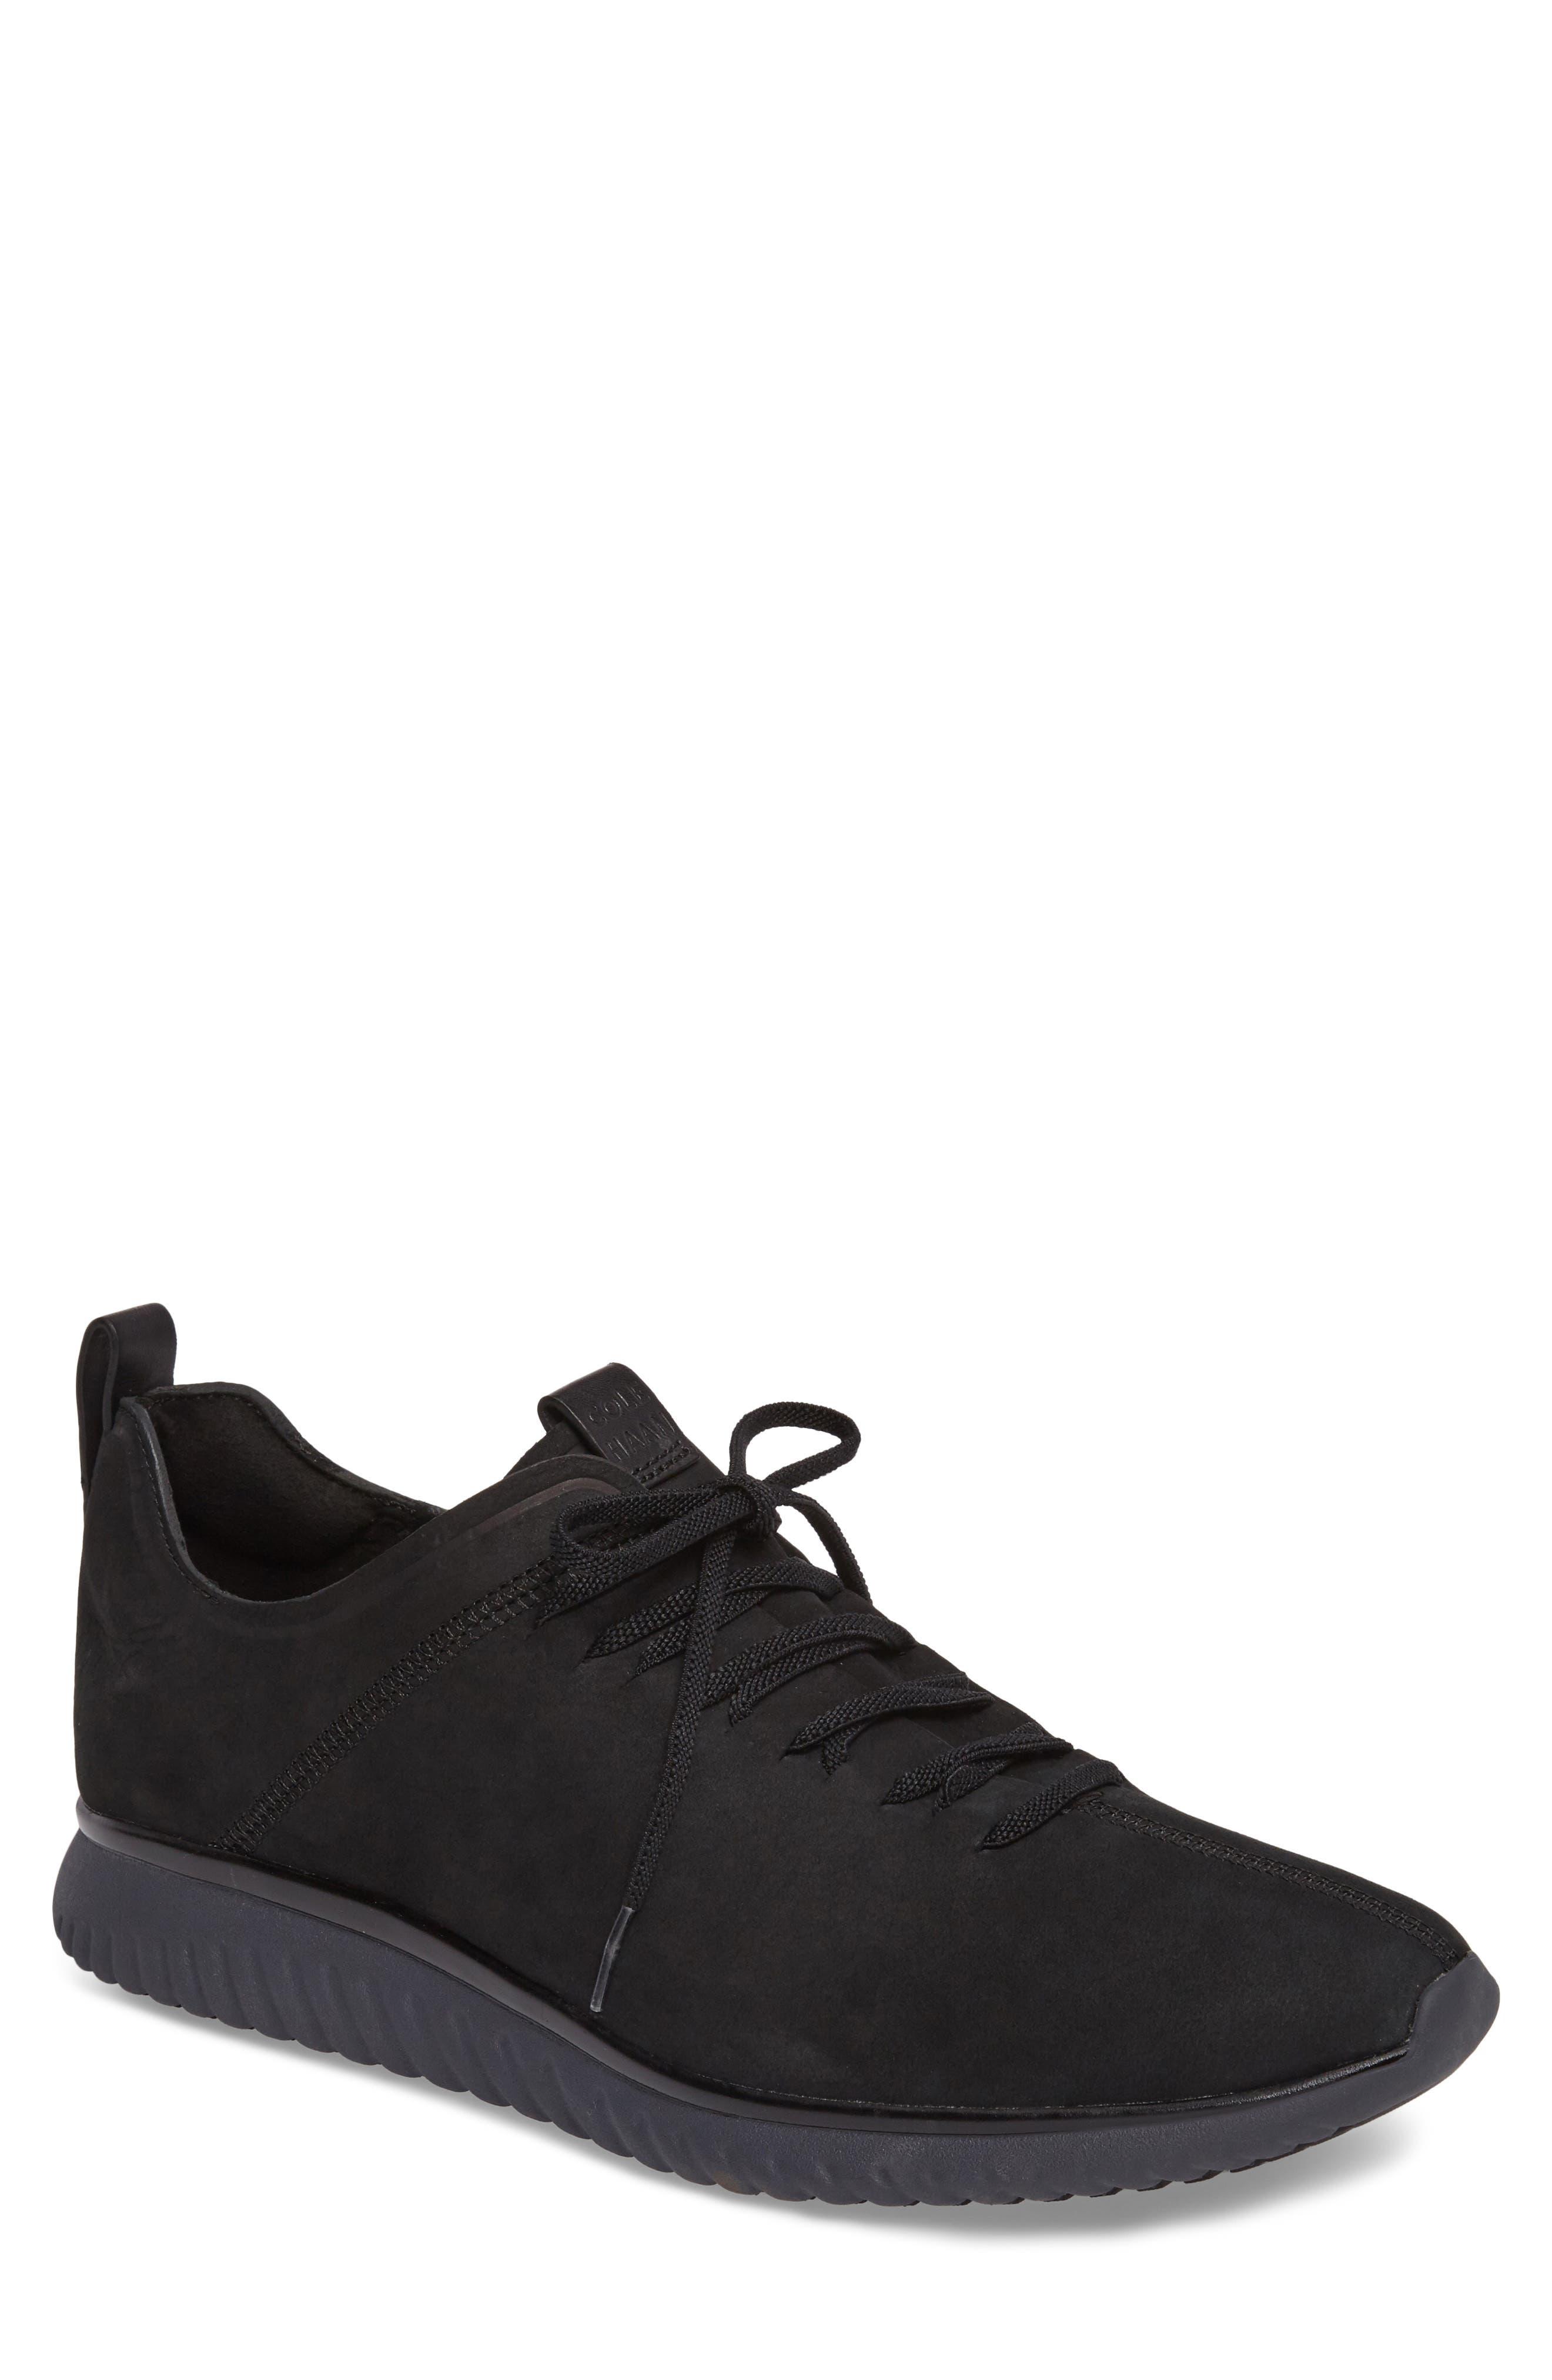 2.ZeroGrand Sneaker,                             Main thumbnail 1, color,                             001